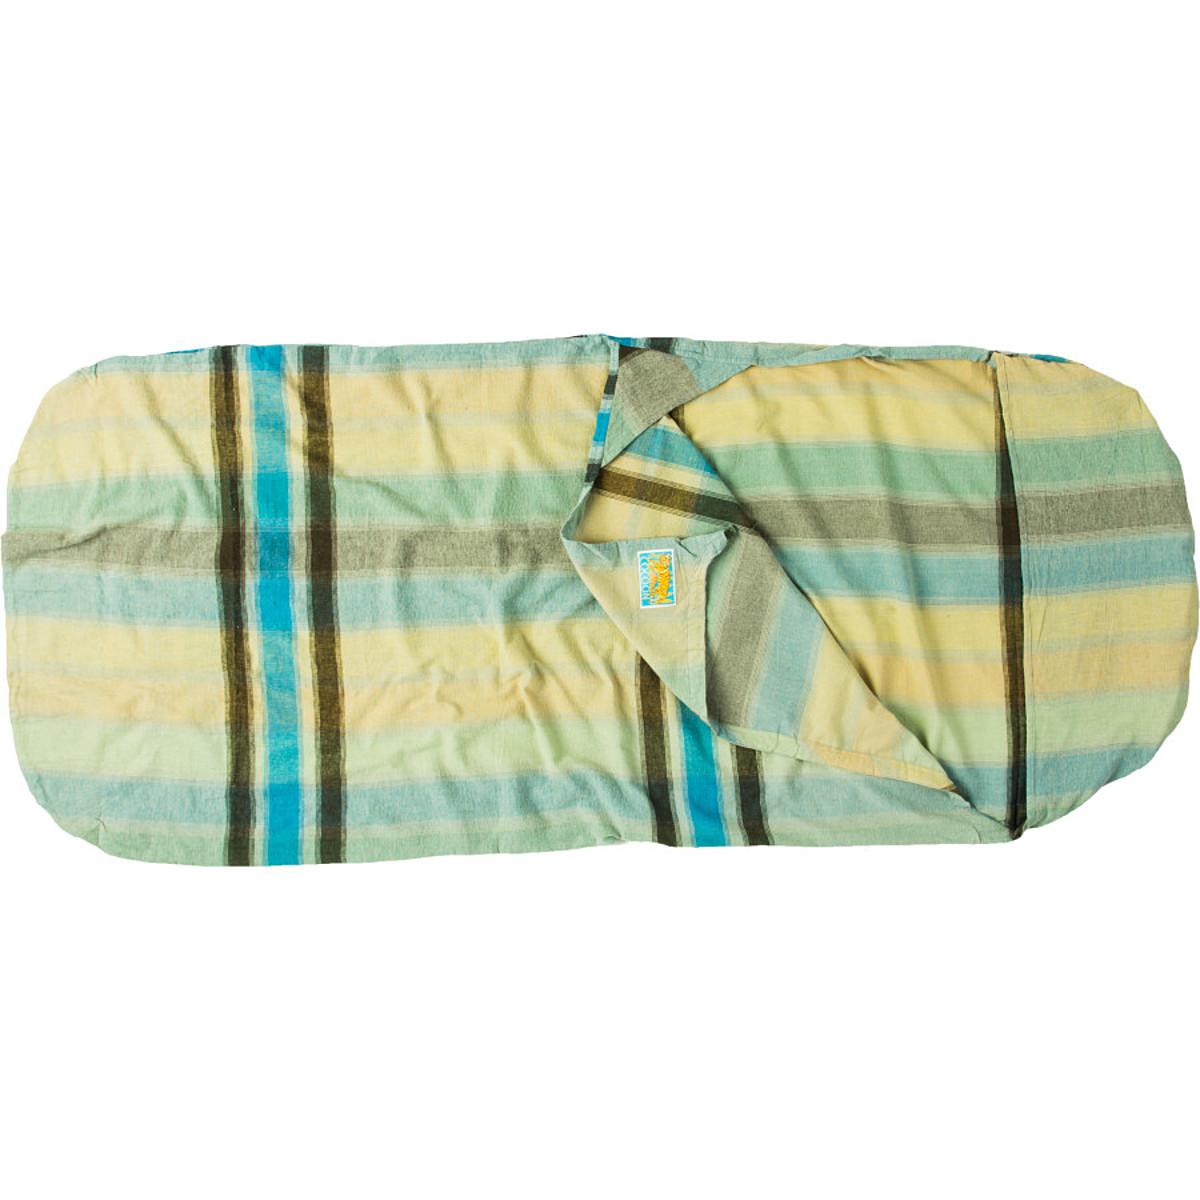 photo: Cocoon KidSack Cotton sleeping bag liner